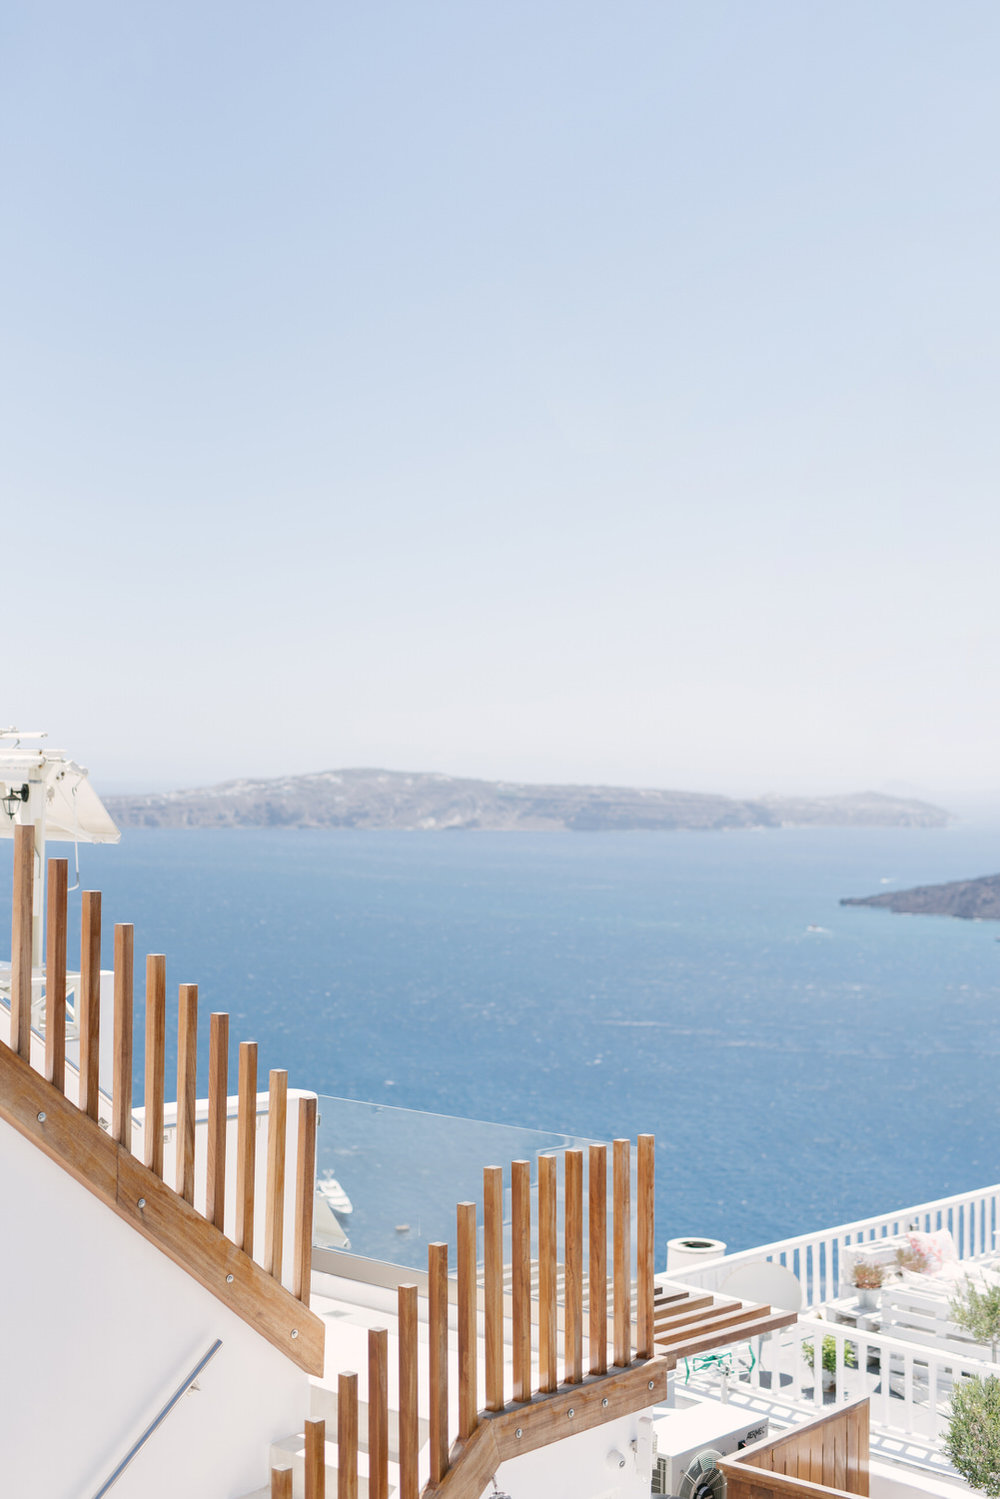 Santorini-@Bottega53-29.jpg